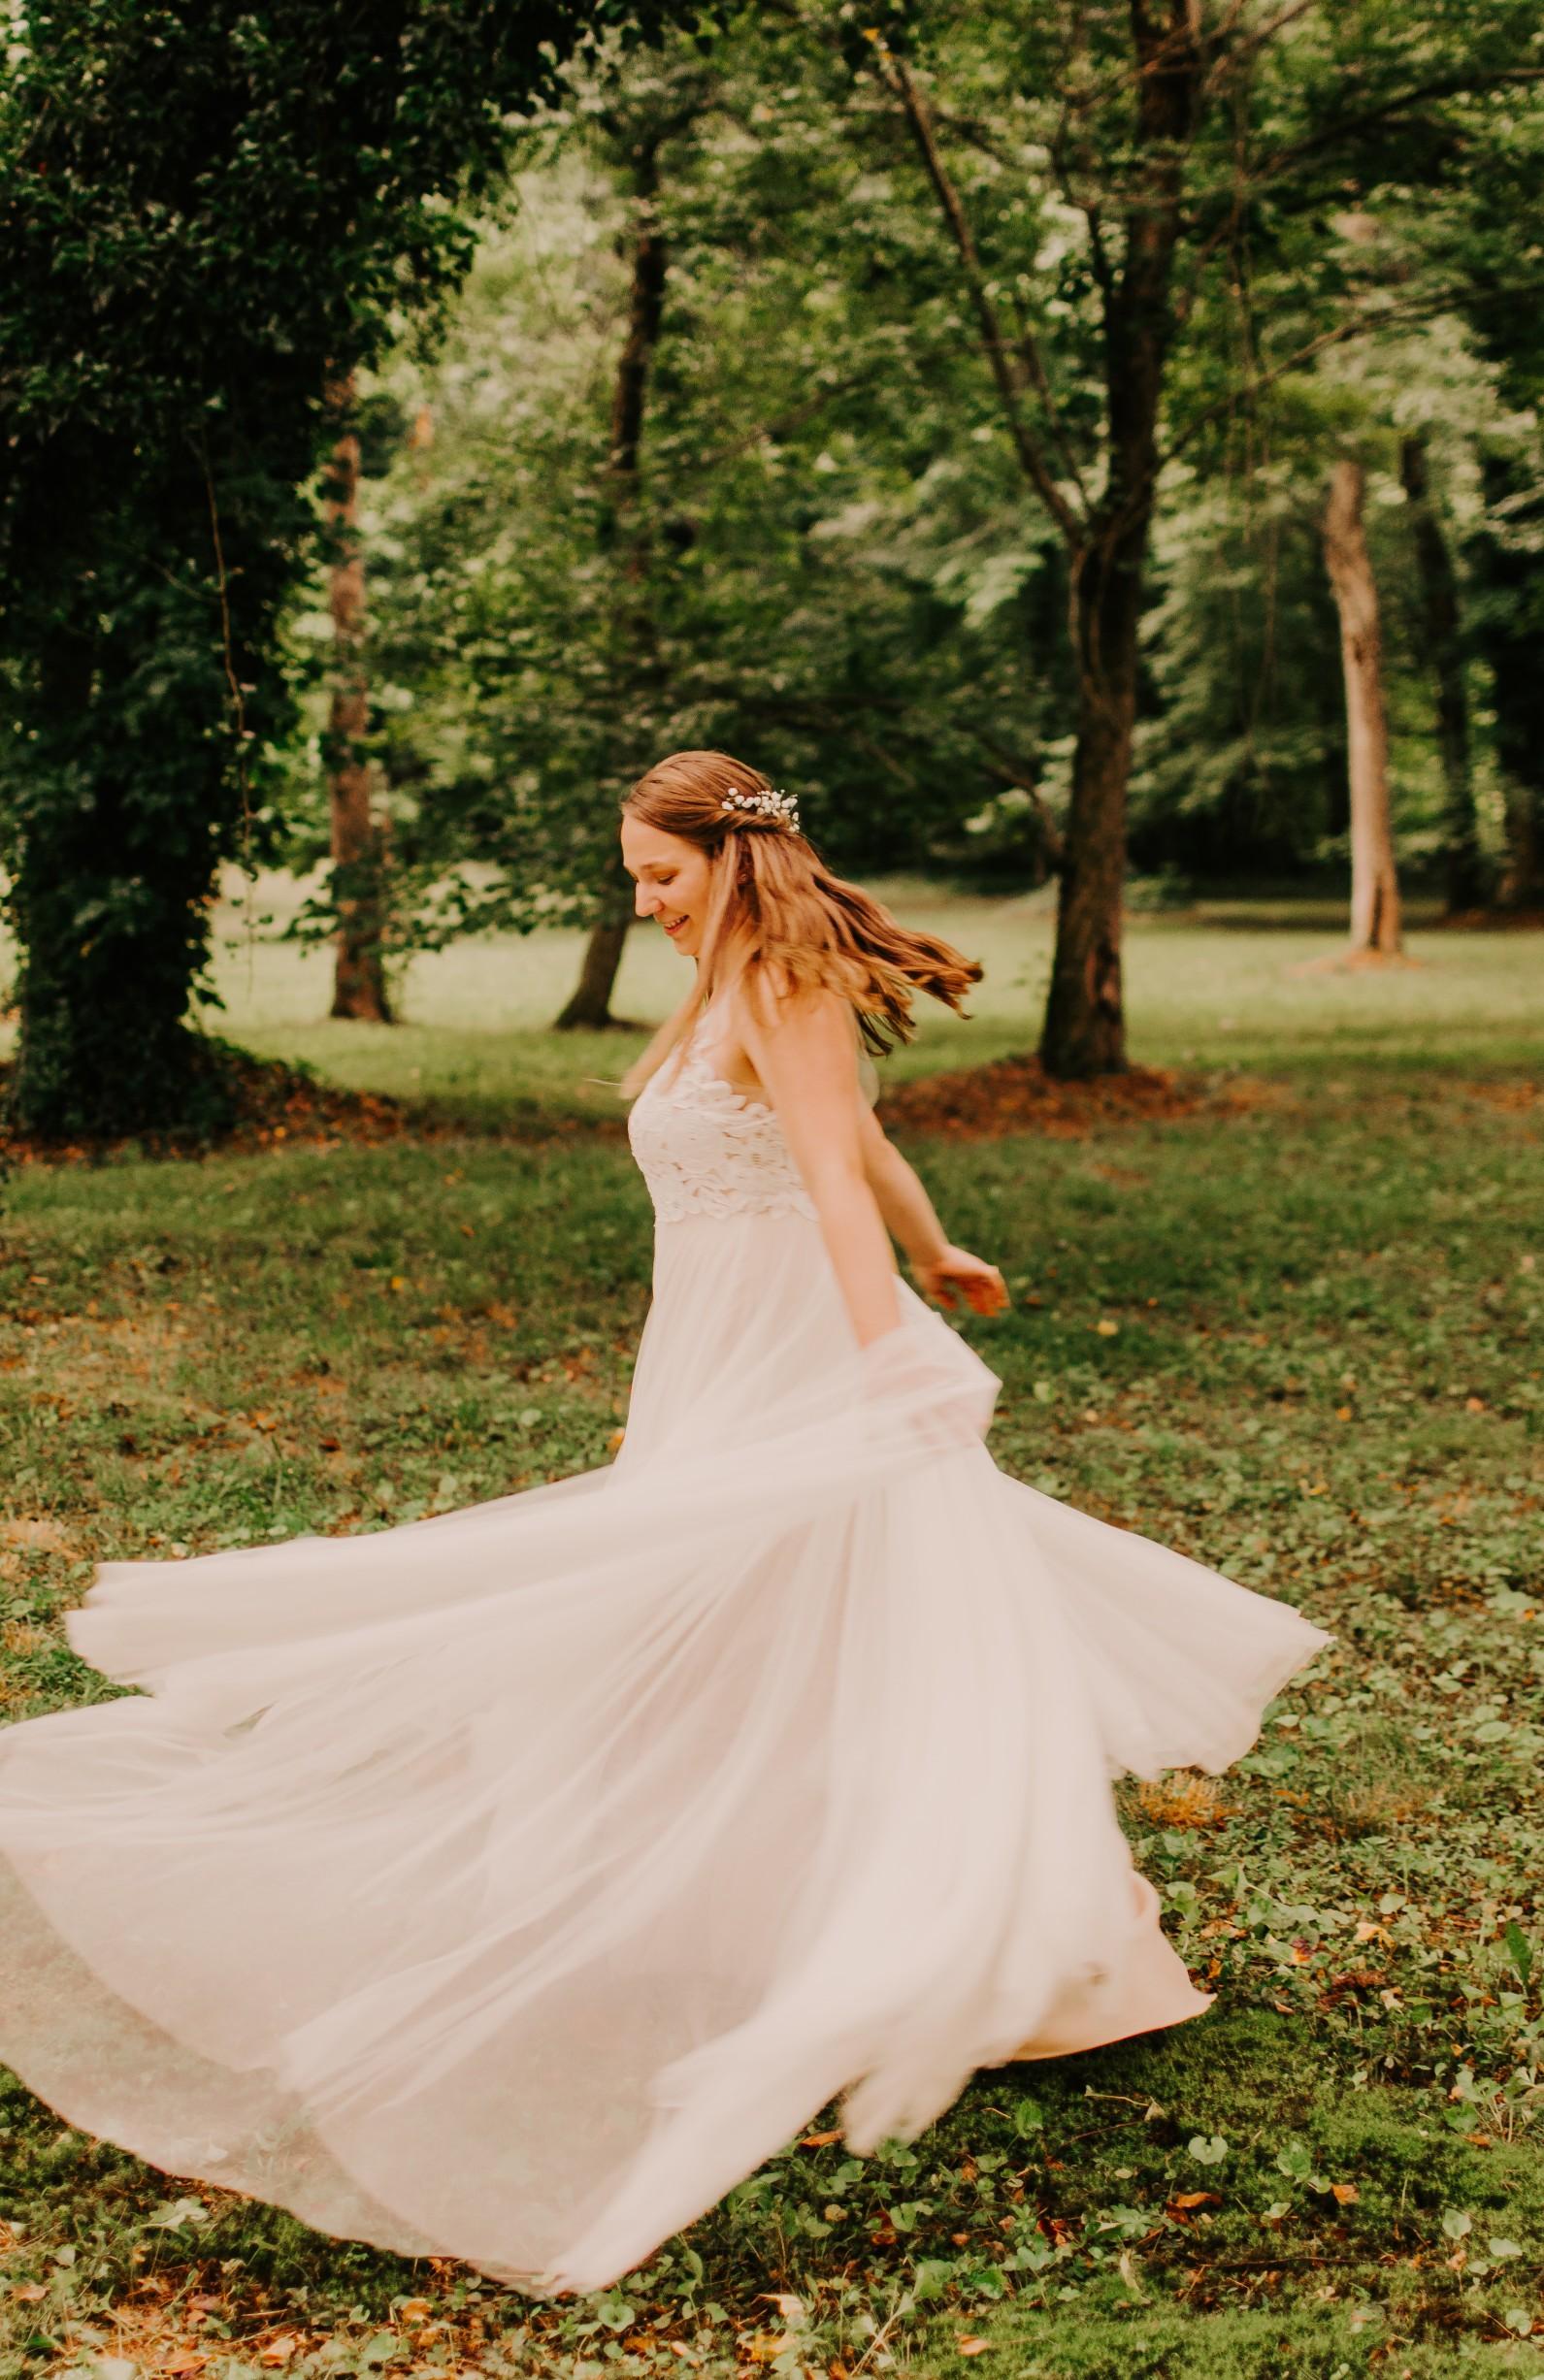 bride-portrait-photo.jpg.